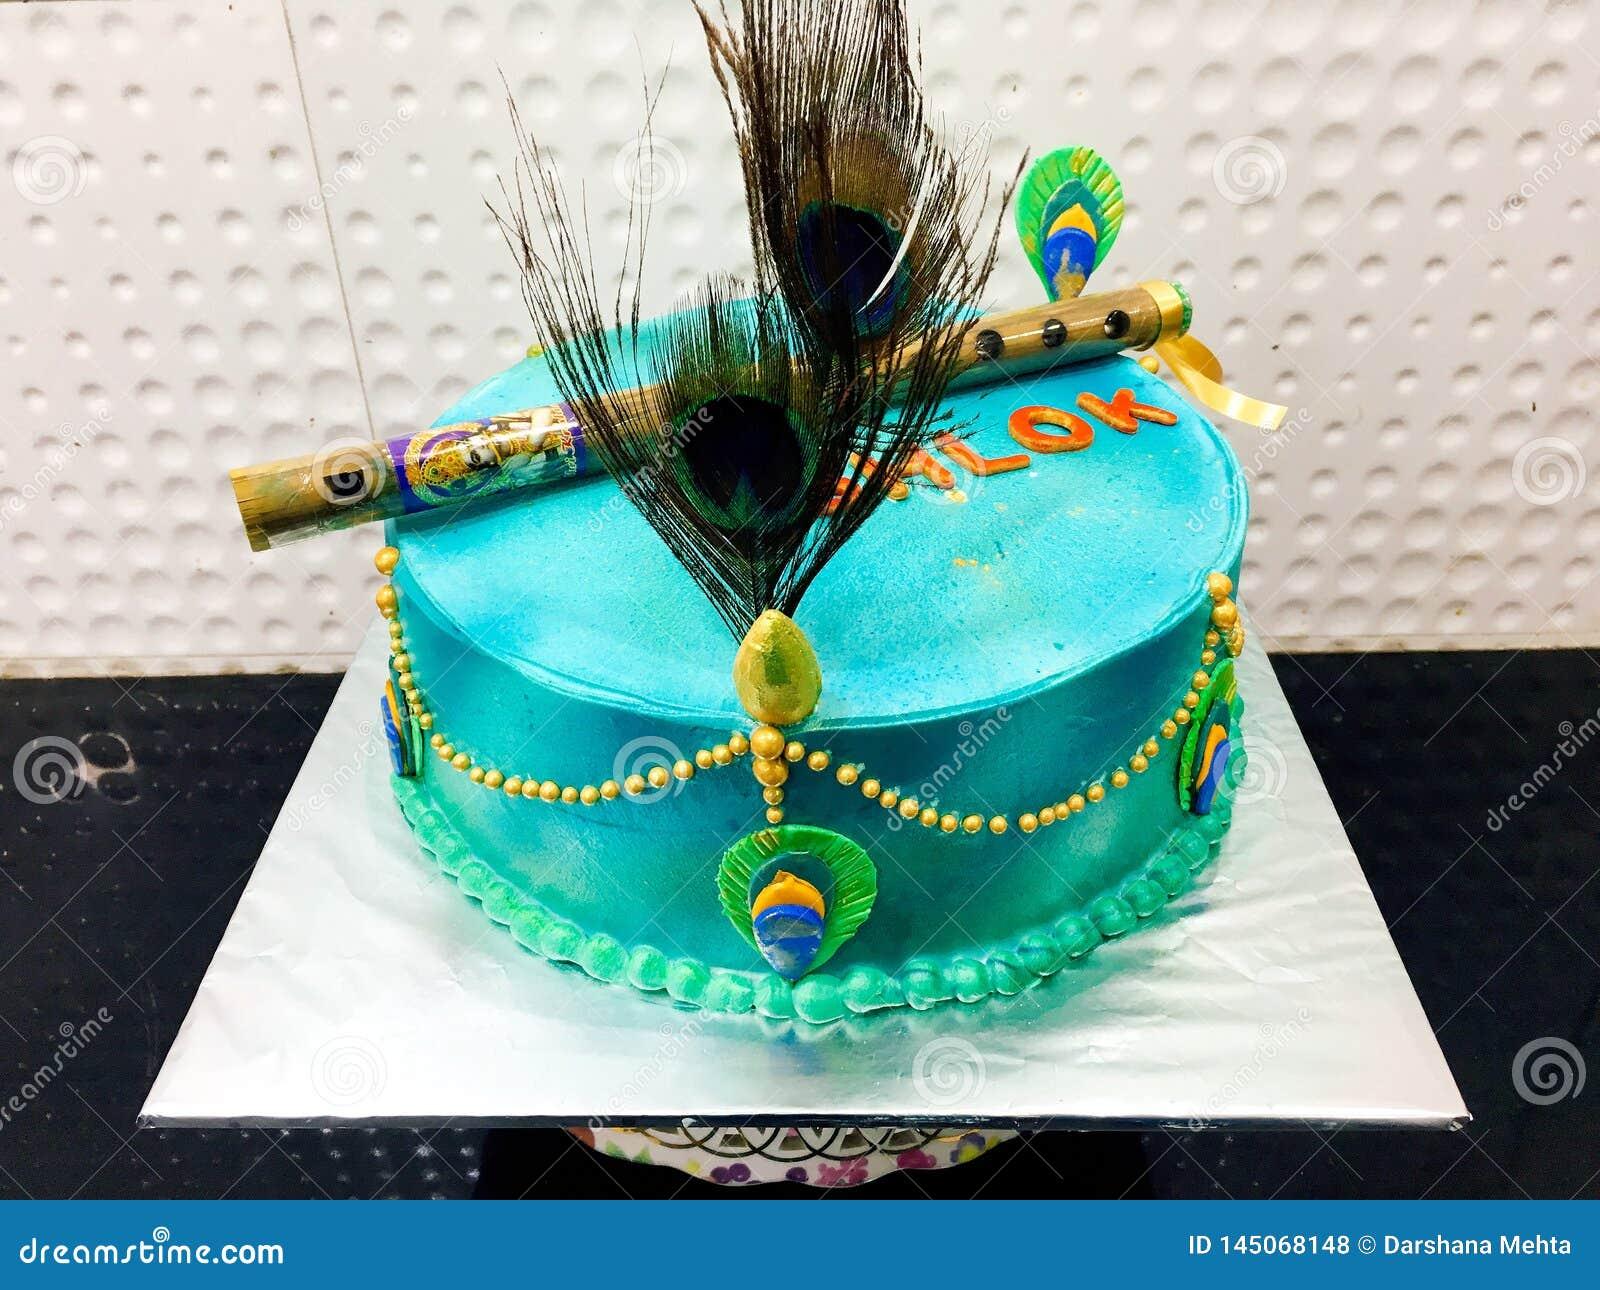 Phenomenal Birthday Cake Stock Photo Image Of Flute Cake Peacock 145068148 Personalised Birthday Cards Veneteletsinfo